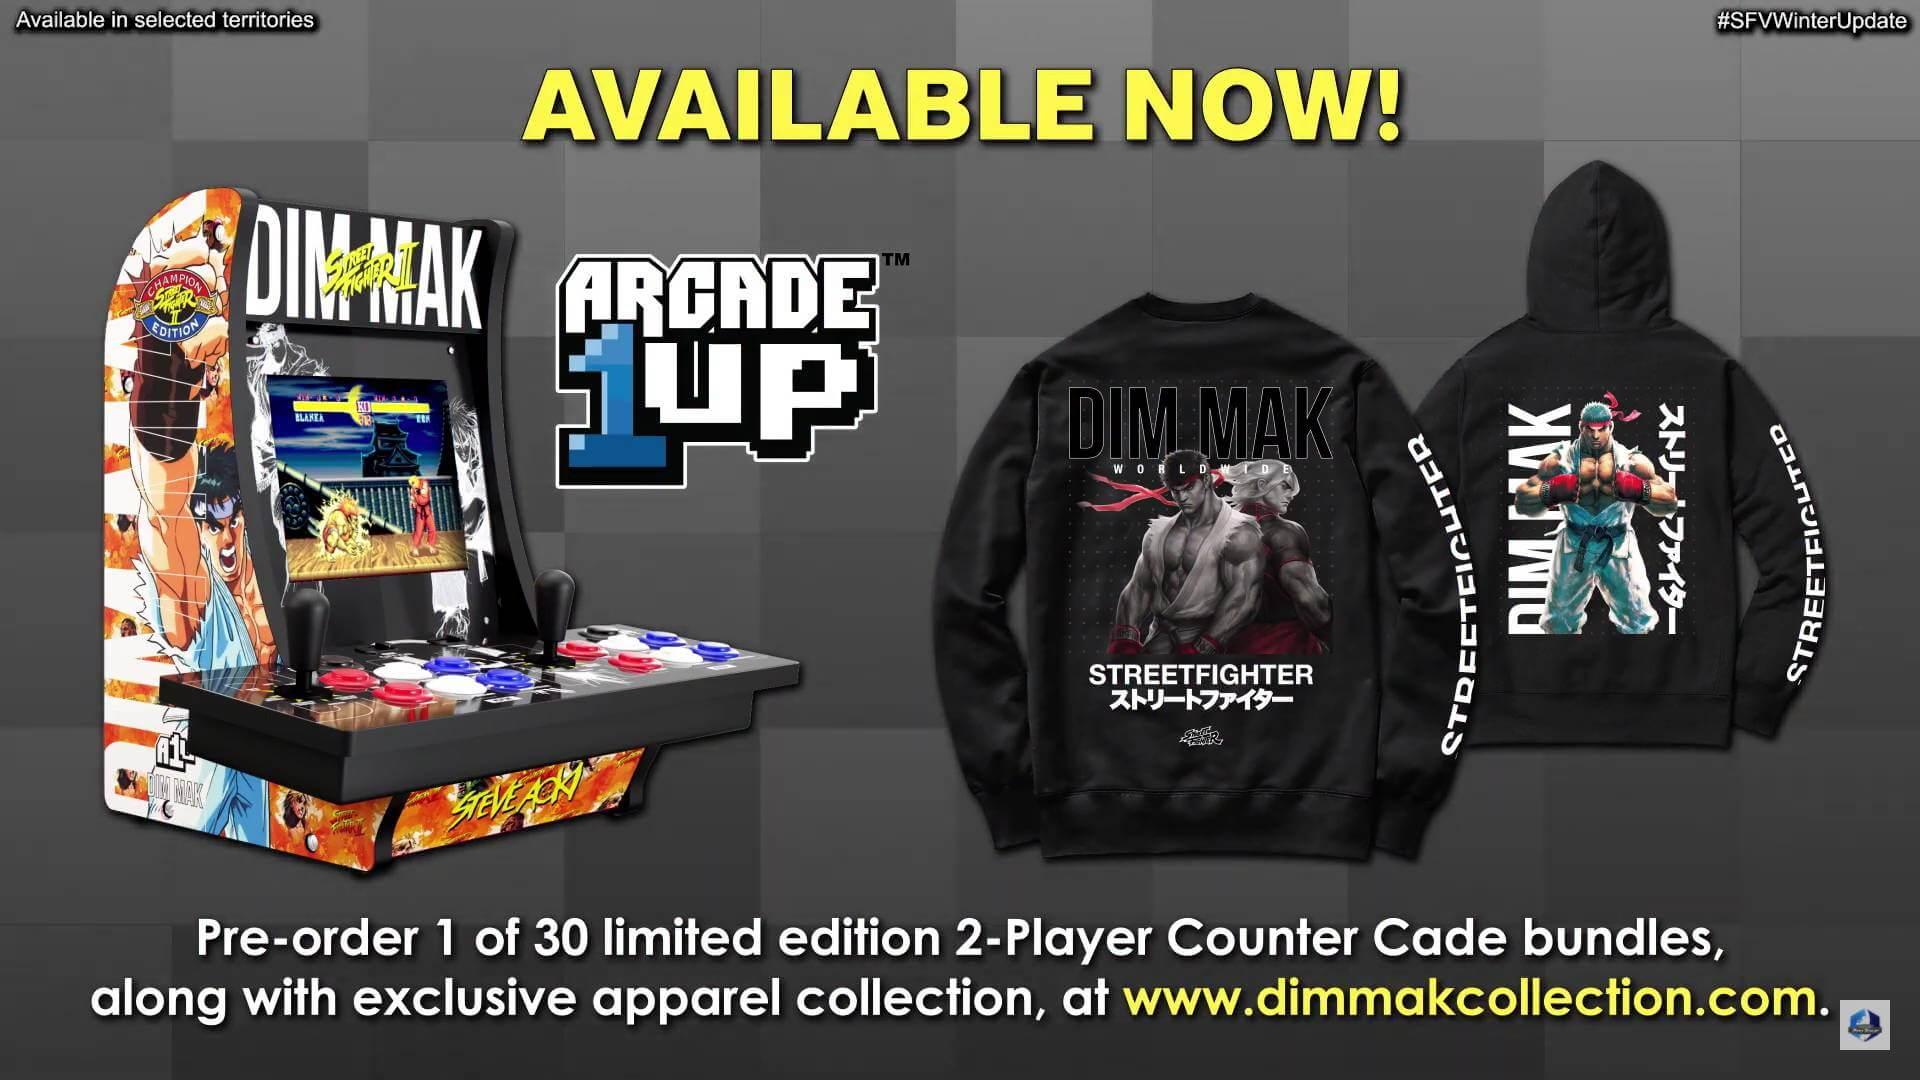 Street Fighter 5 Winter Update - new merchandise